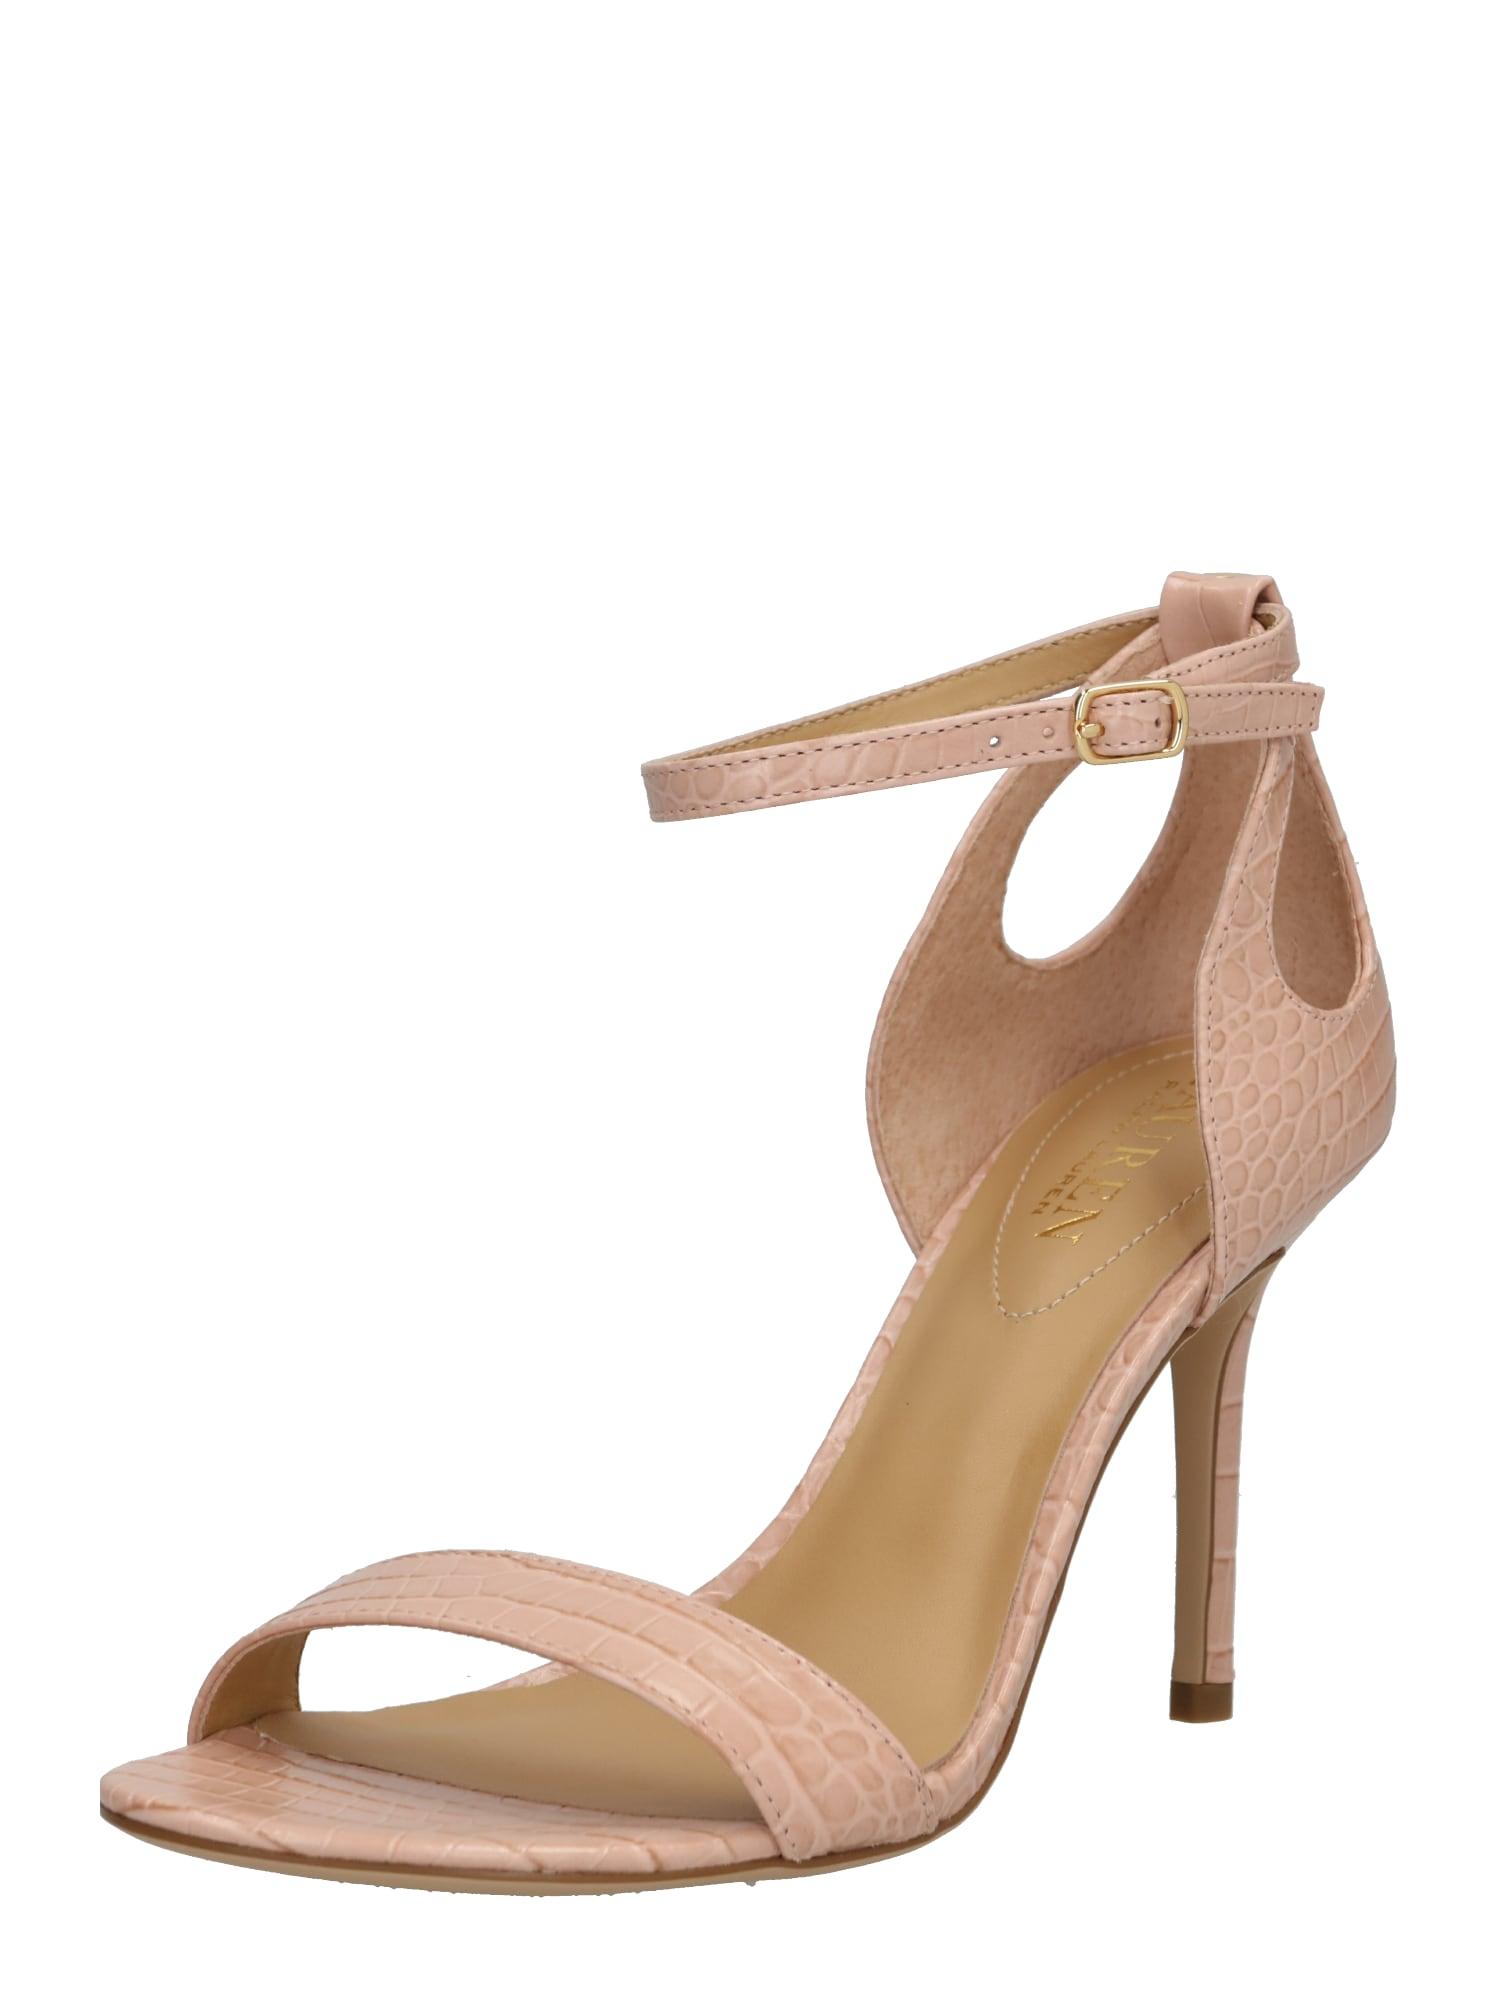 Sandály GRETCHIN-SANDALS růžová Lauren Ralph Lauren